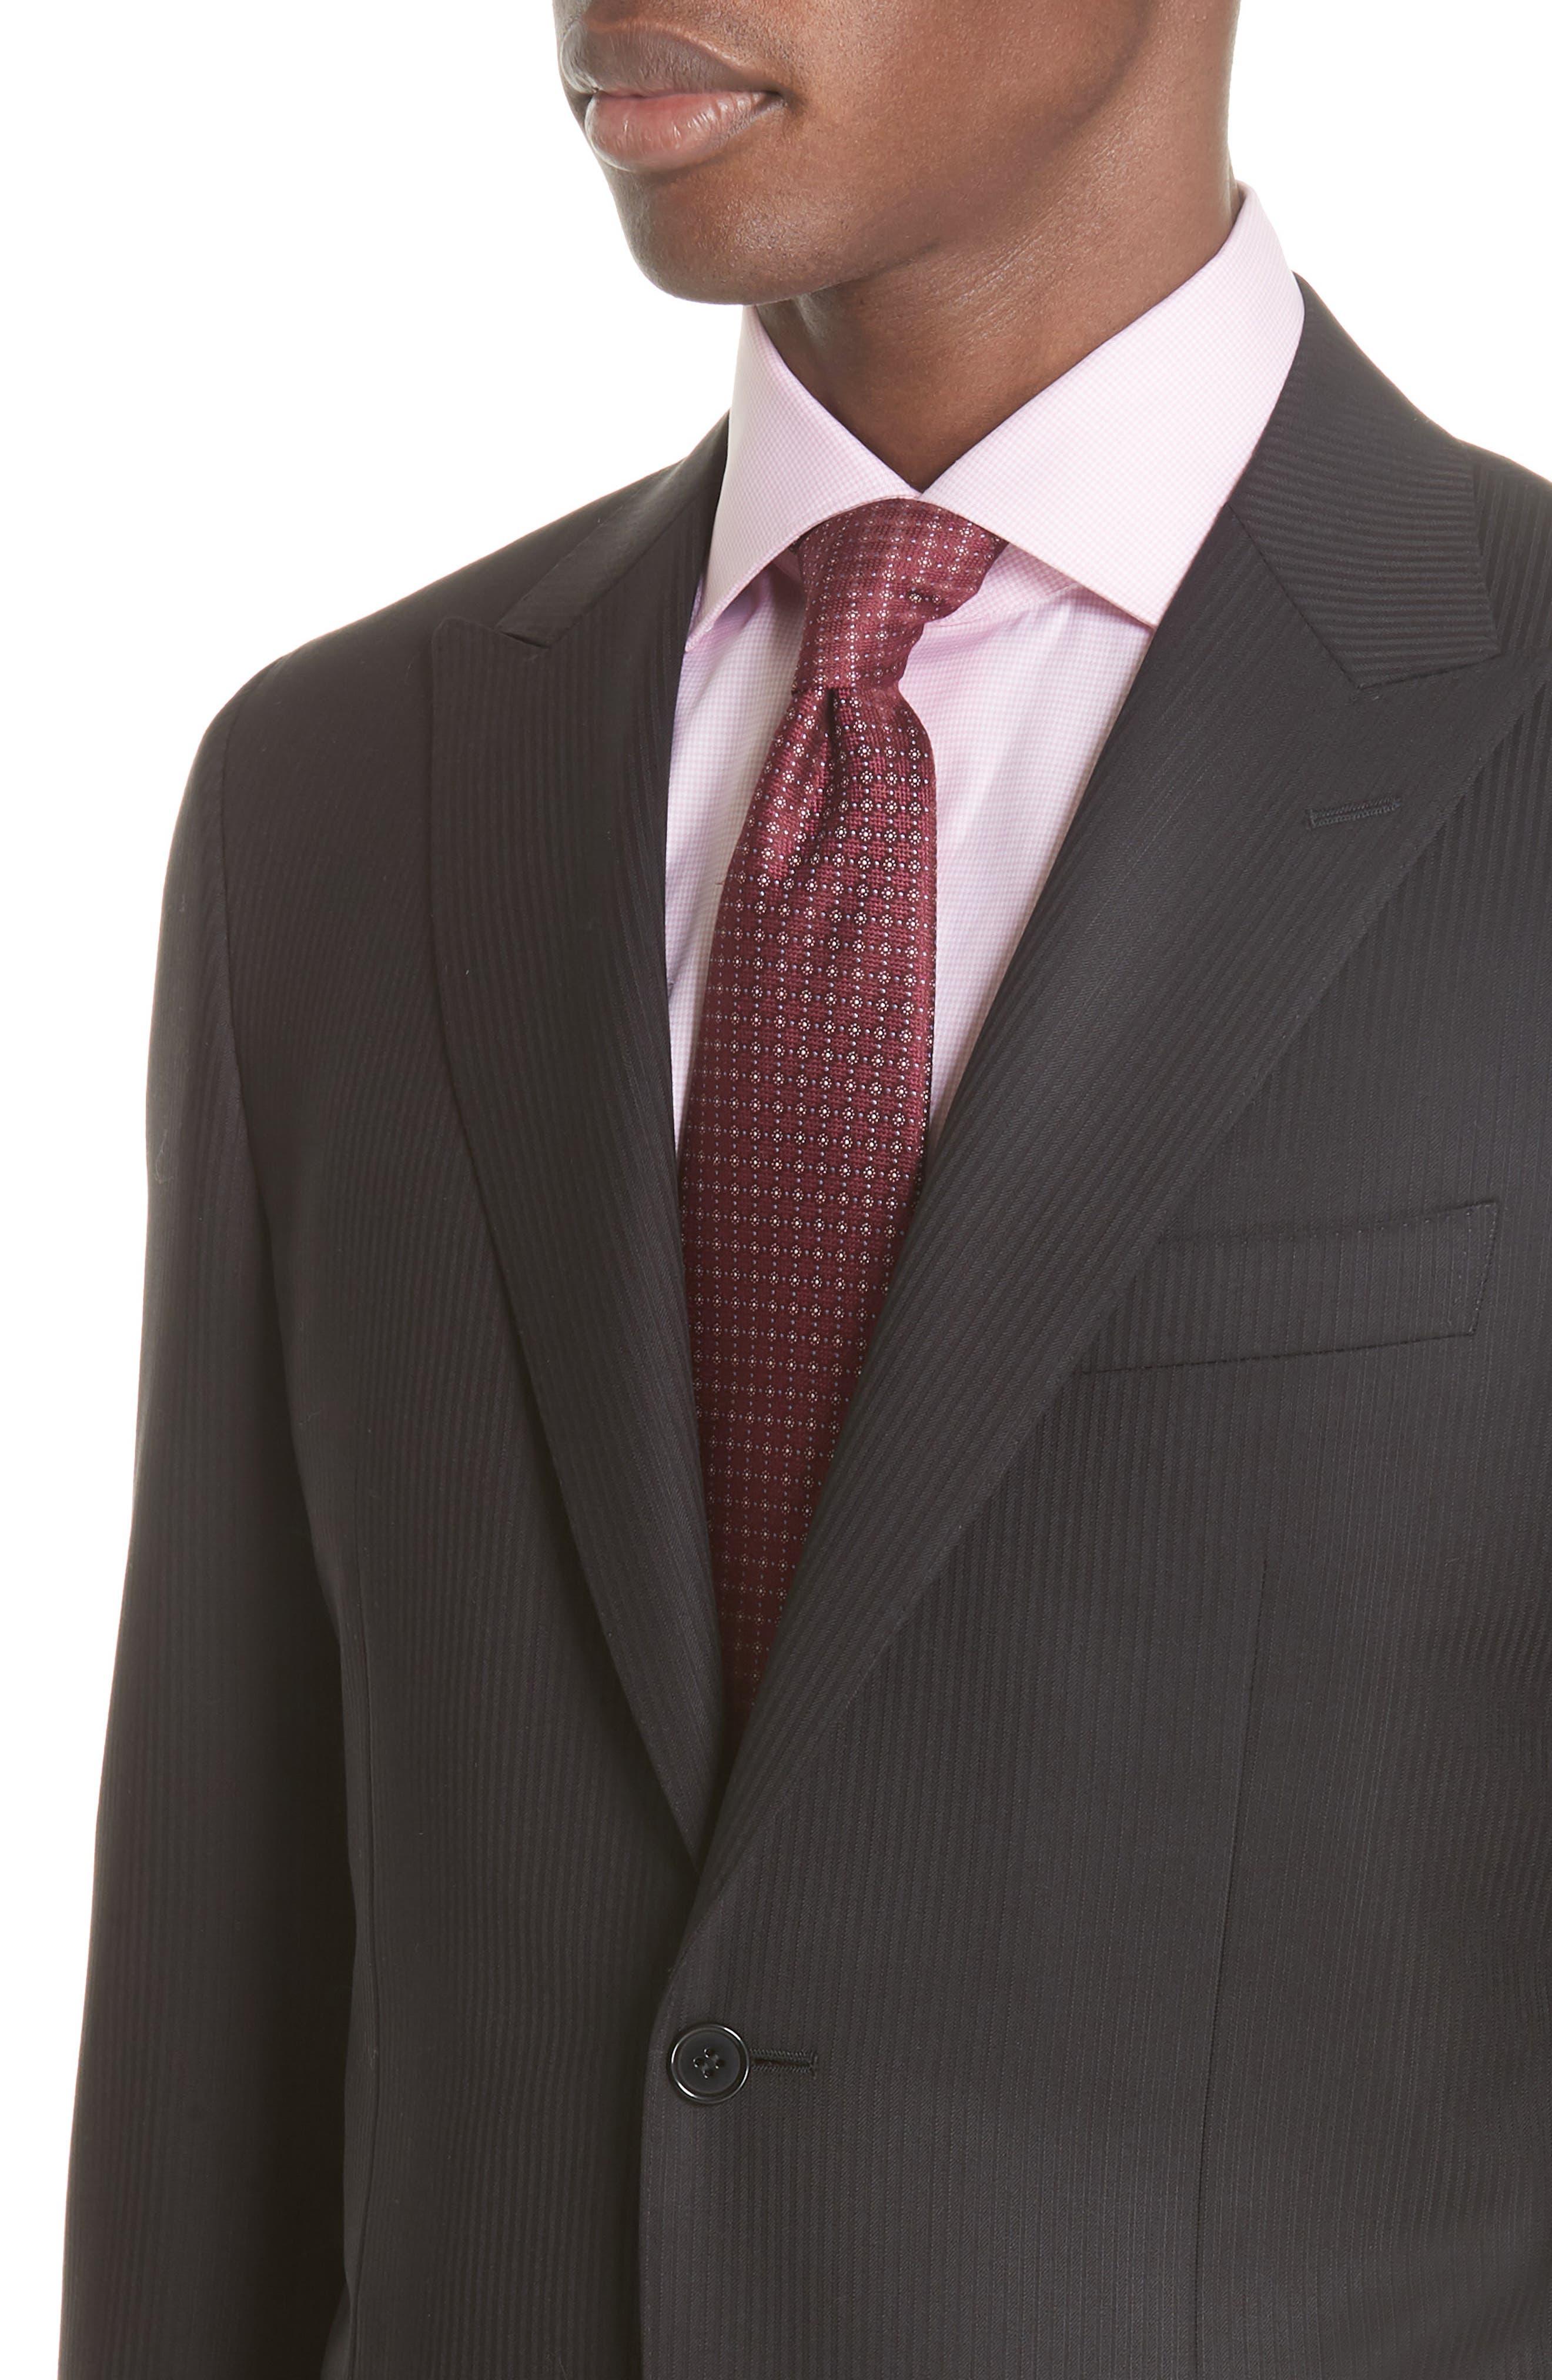 Siena Classic Fit Stripe Wool Suit,                             Alternate thumbnail 4, color,